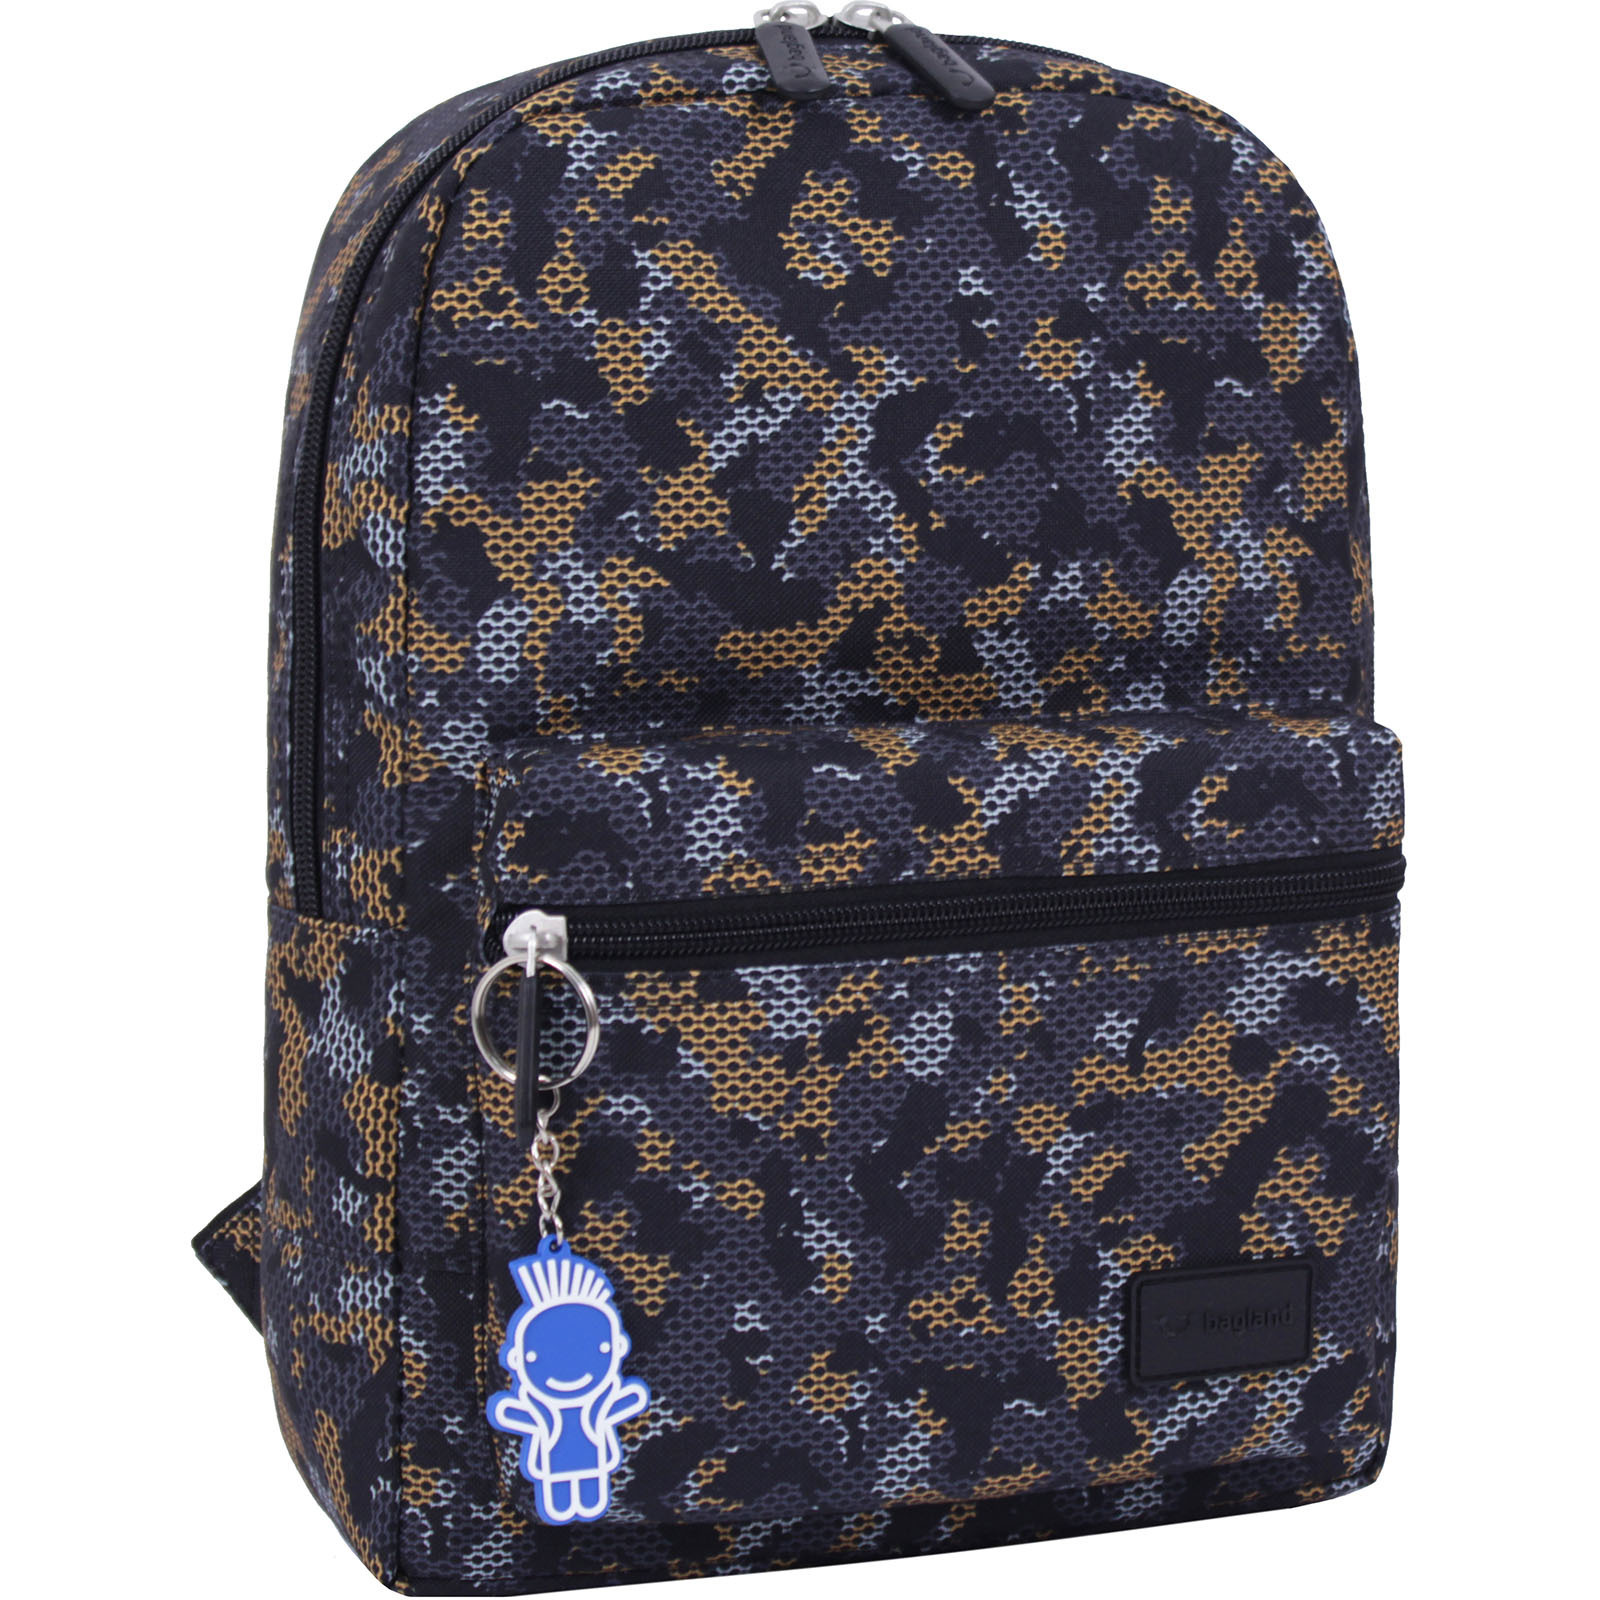 Молодежные рюкзаки Рюкзак Bagland Молодежный mini 8 л. сублимация 455 (00508664) IMG_3757_суб.455_.JPG